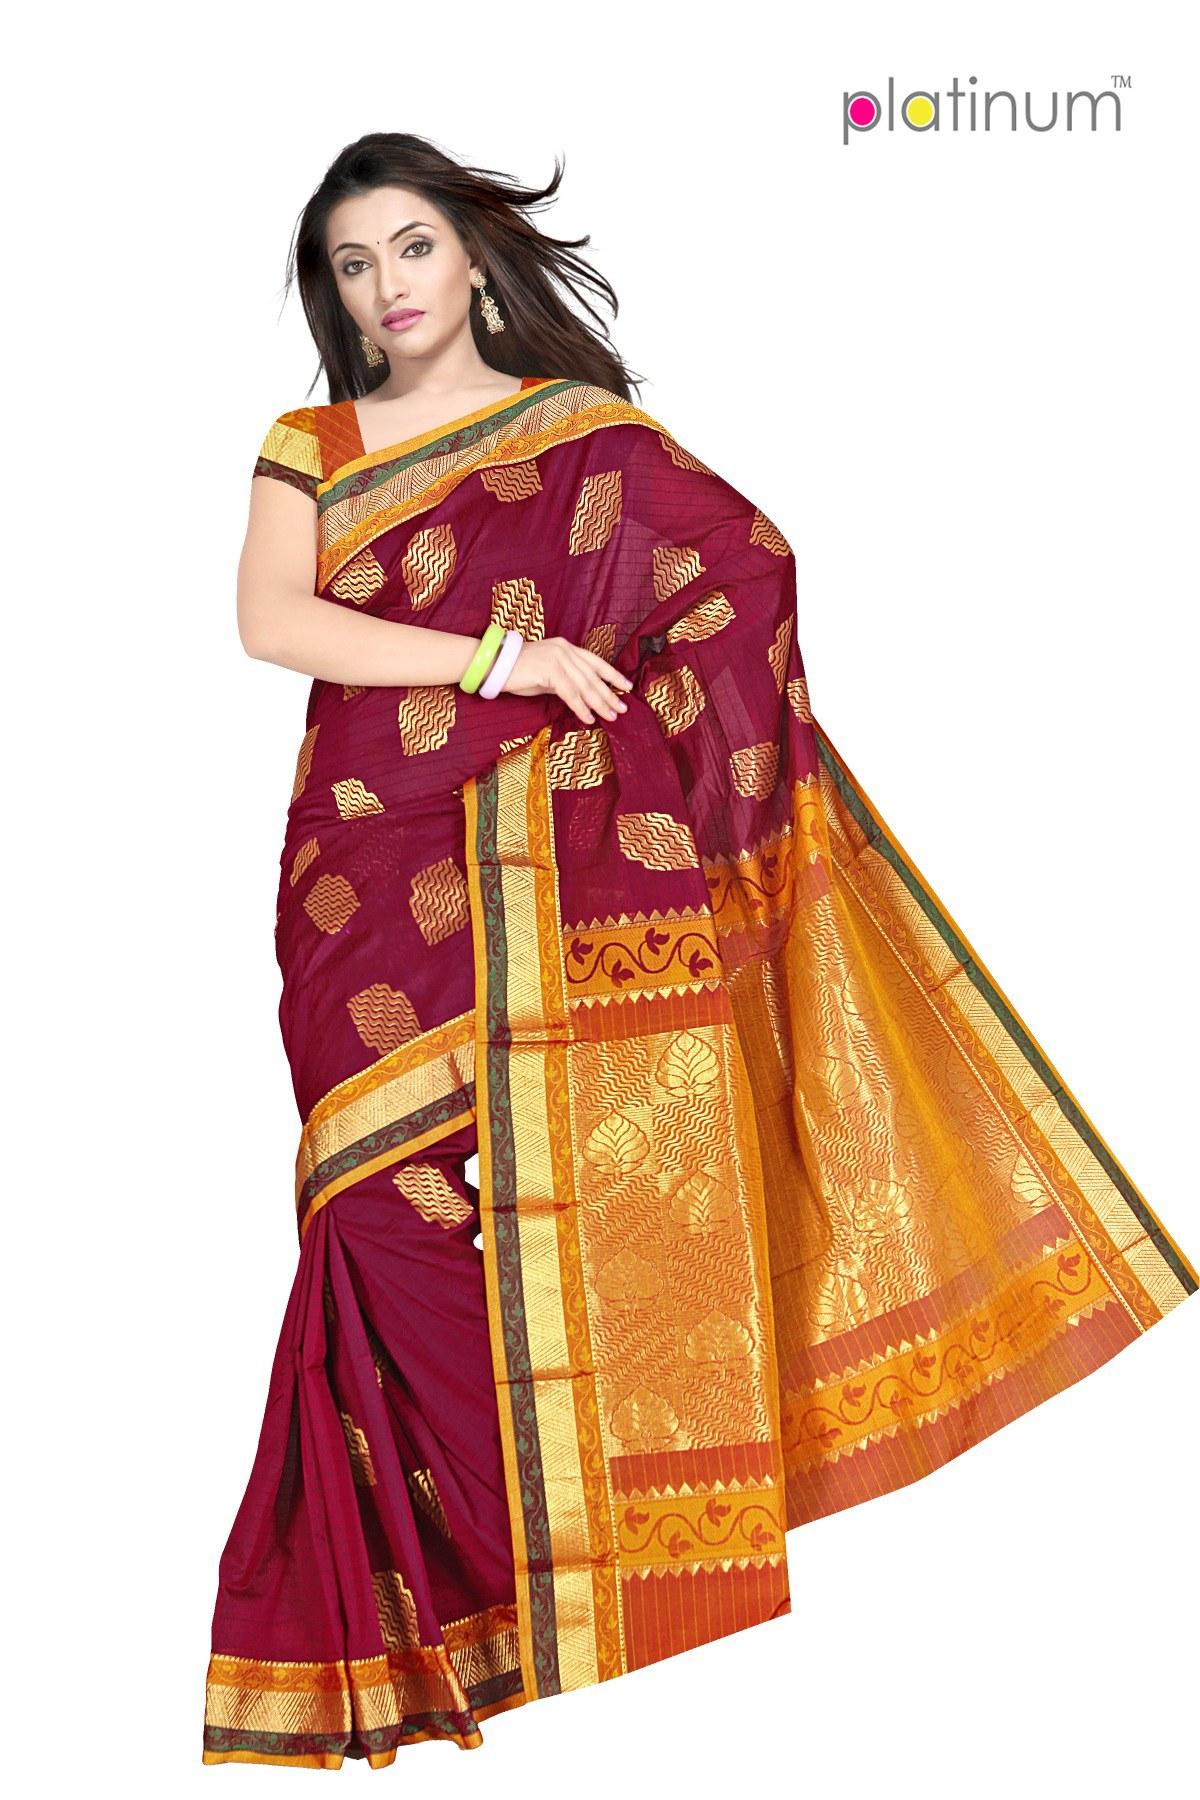 pastel maroon designer zari saree ps317 online shopping for silk sarees by platinum online. Black Bedroom Furniture Sets. Home Design Ideas